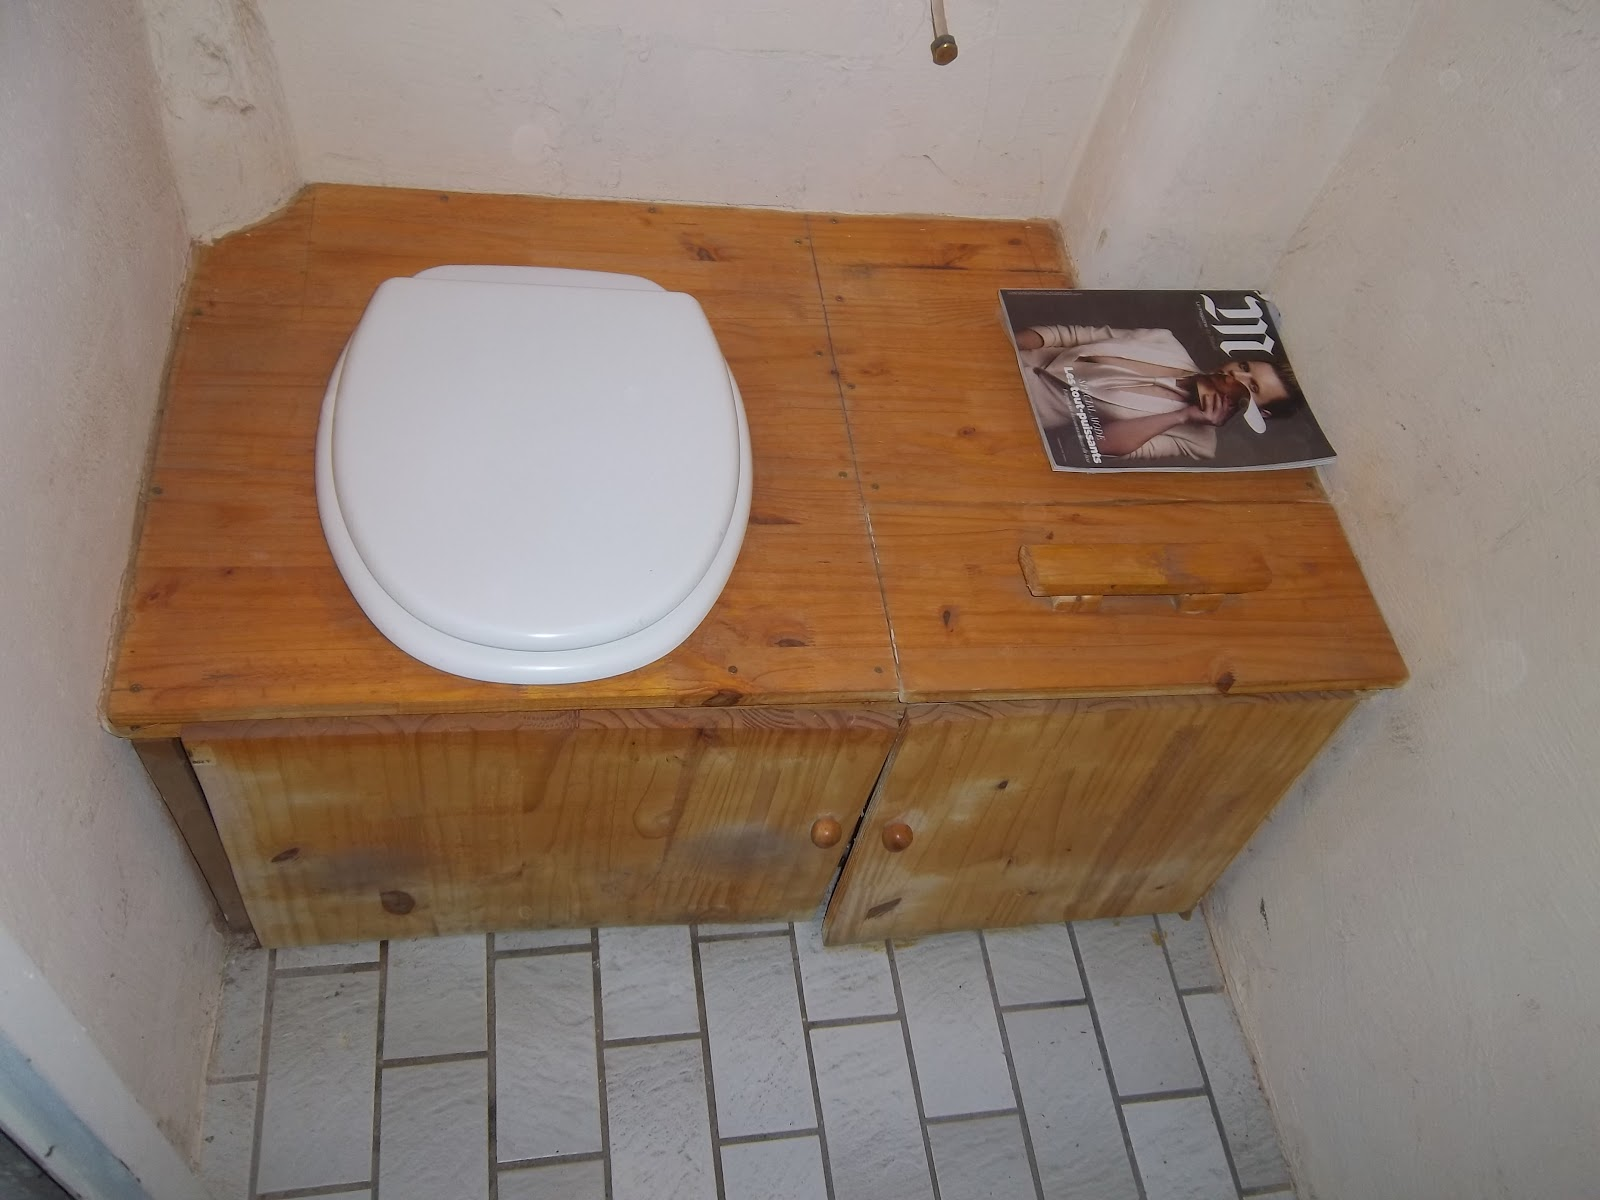 petites astuces entre filles toilettes s ches. Black Bedroom Furniture Sets. Home Design Ideas